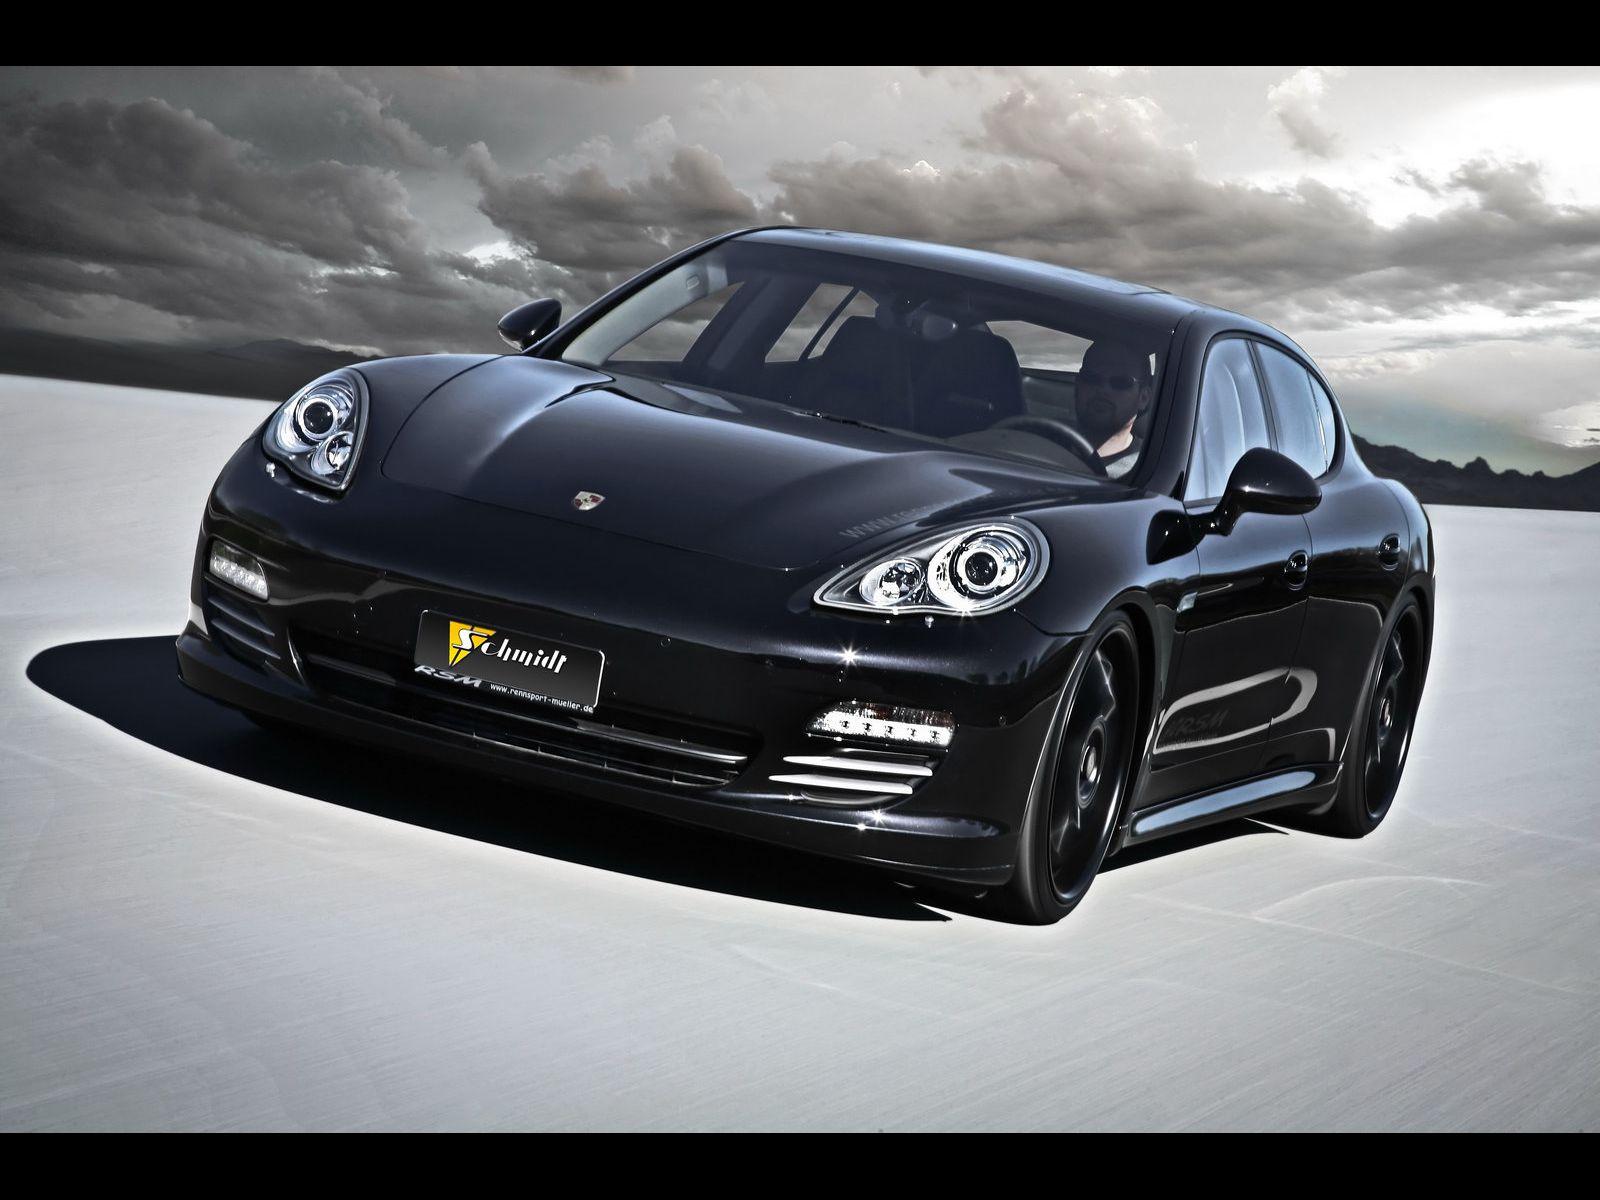 Porsche Panamera 4S to